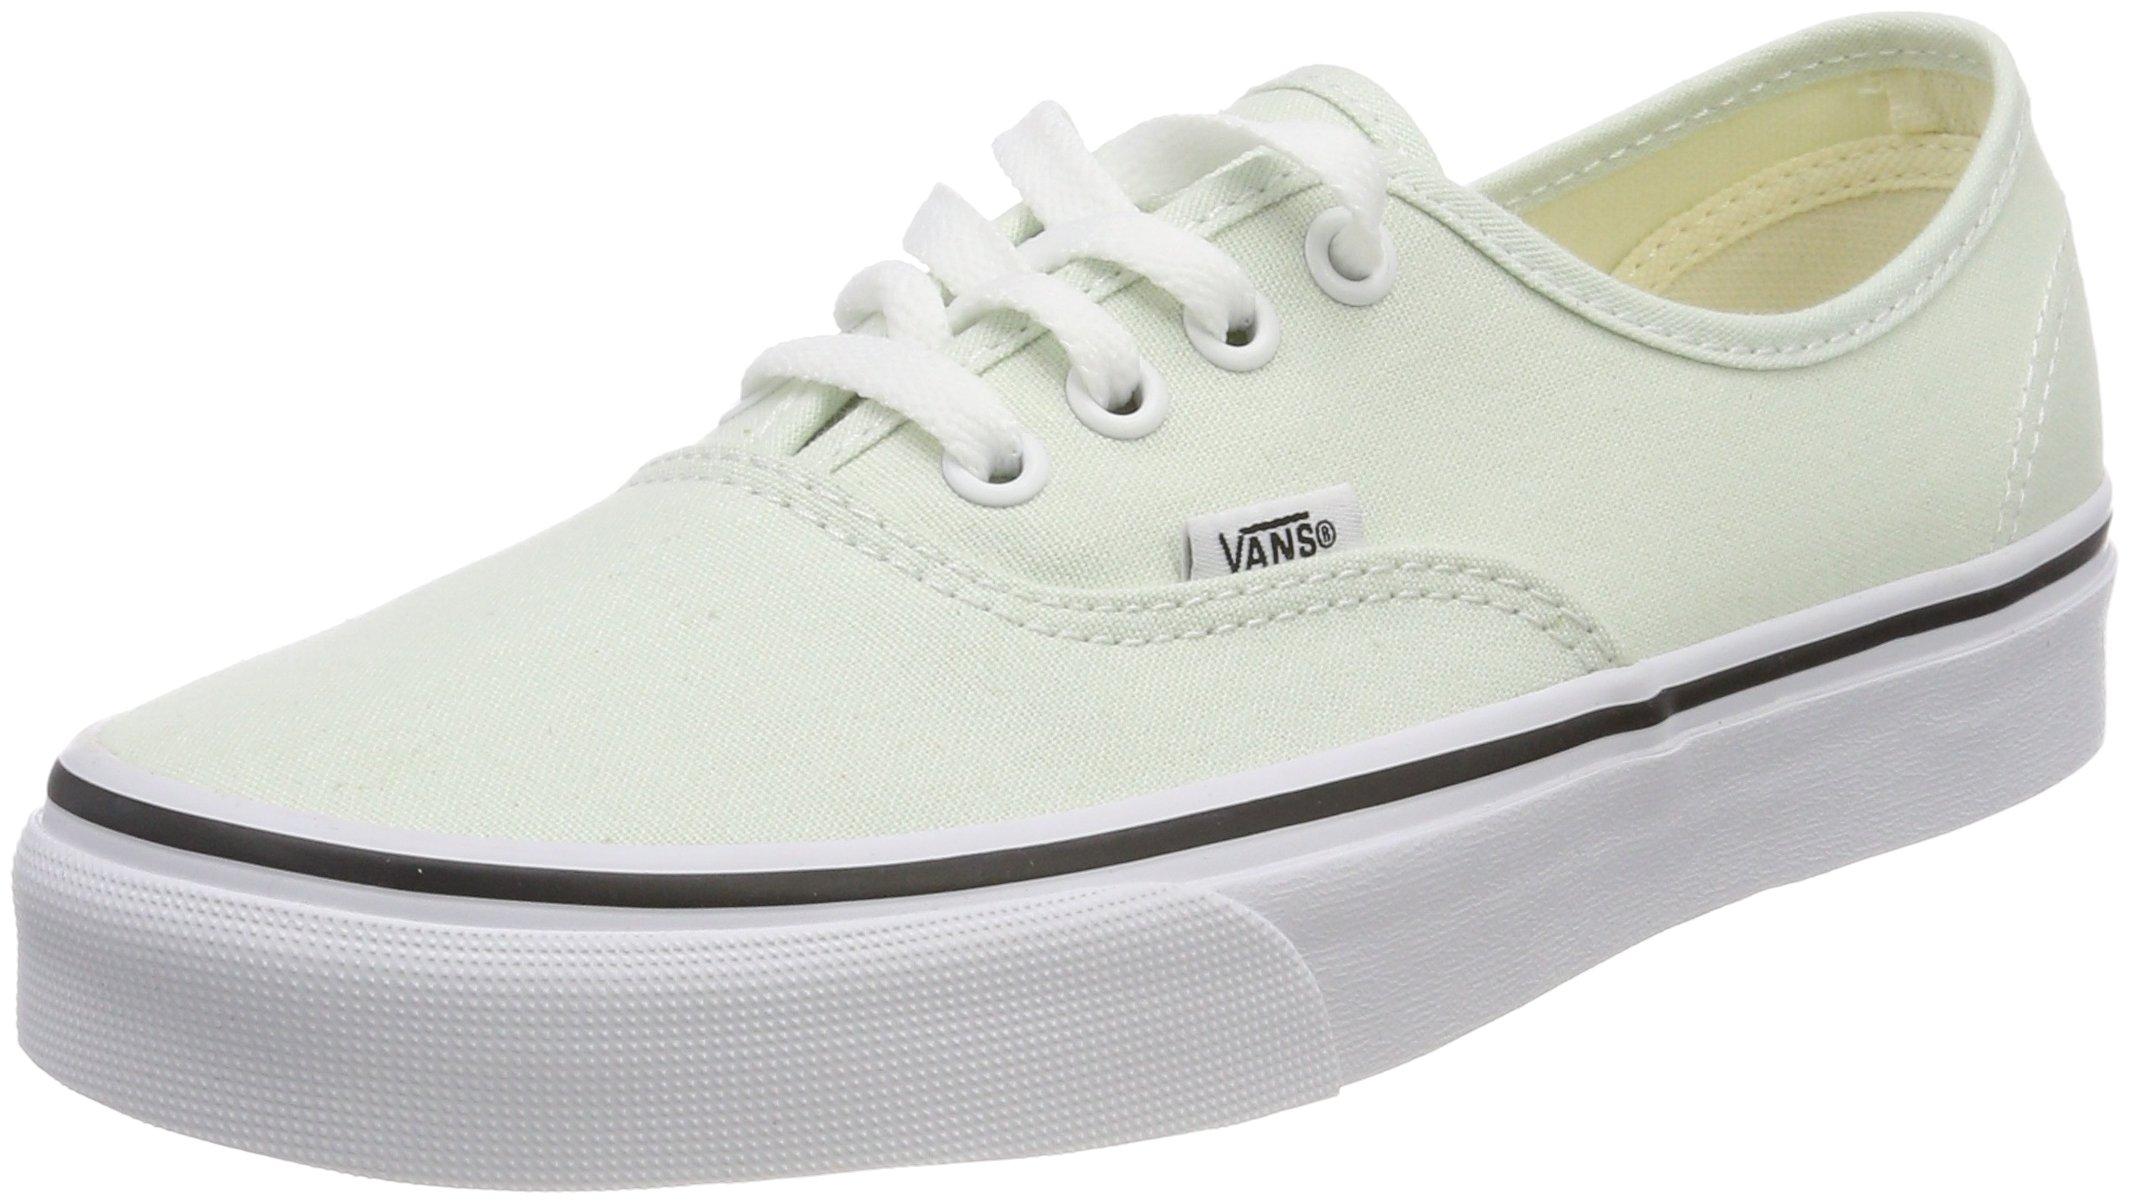 Galleon - Vans Authentic Unisex Shoes Womens Skateboarding-Shoes  VN-0A38EMQ6L 7.5 - Blue Flower True White 3635eed81